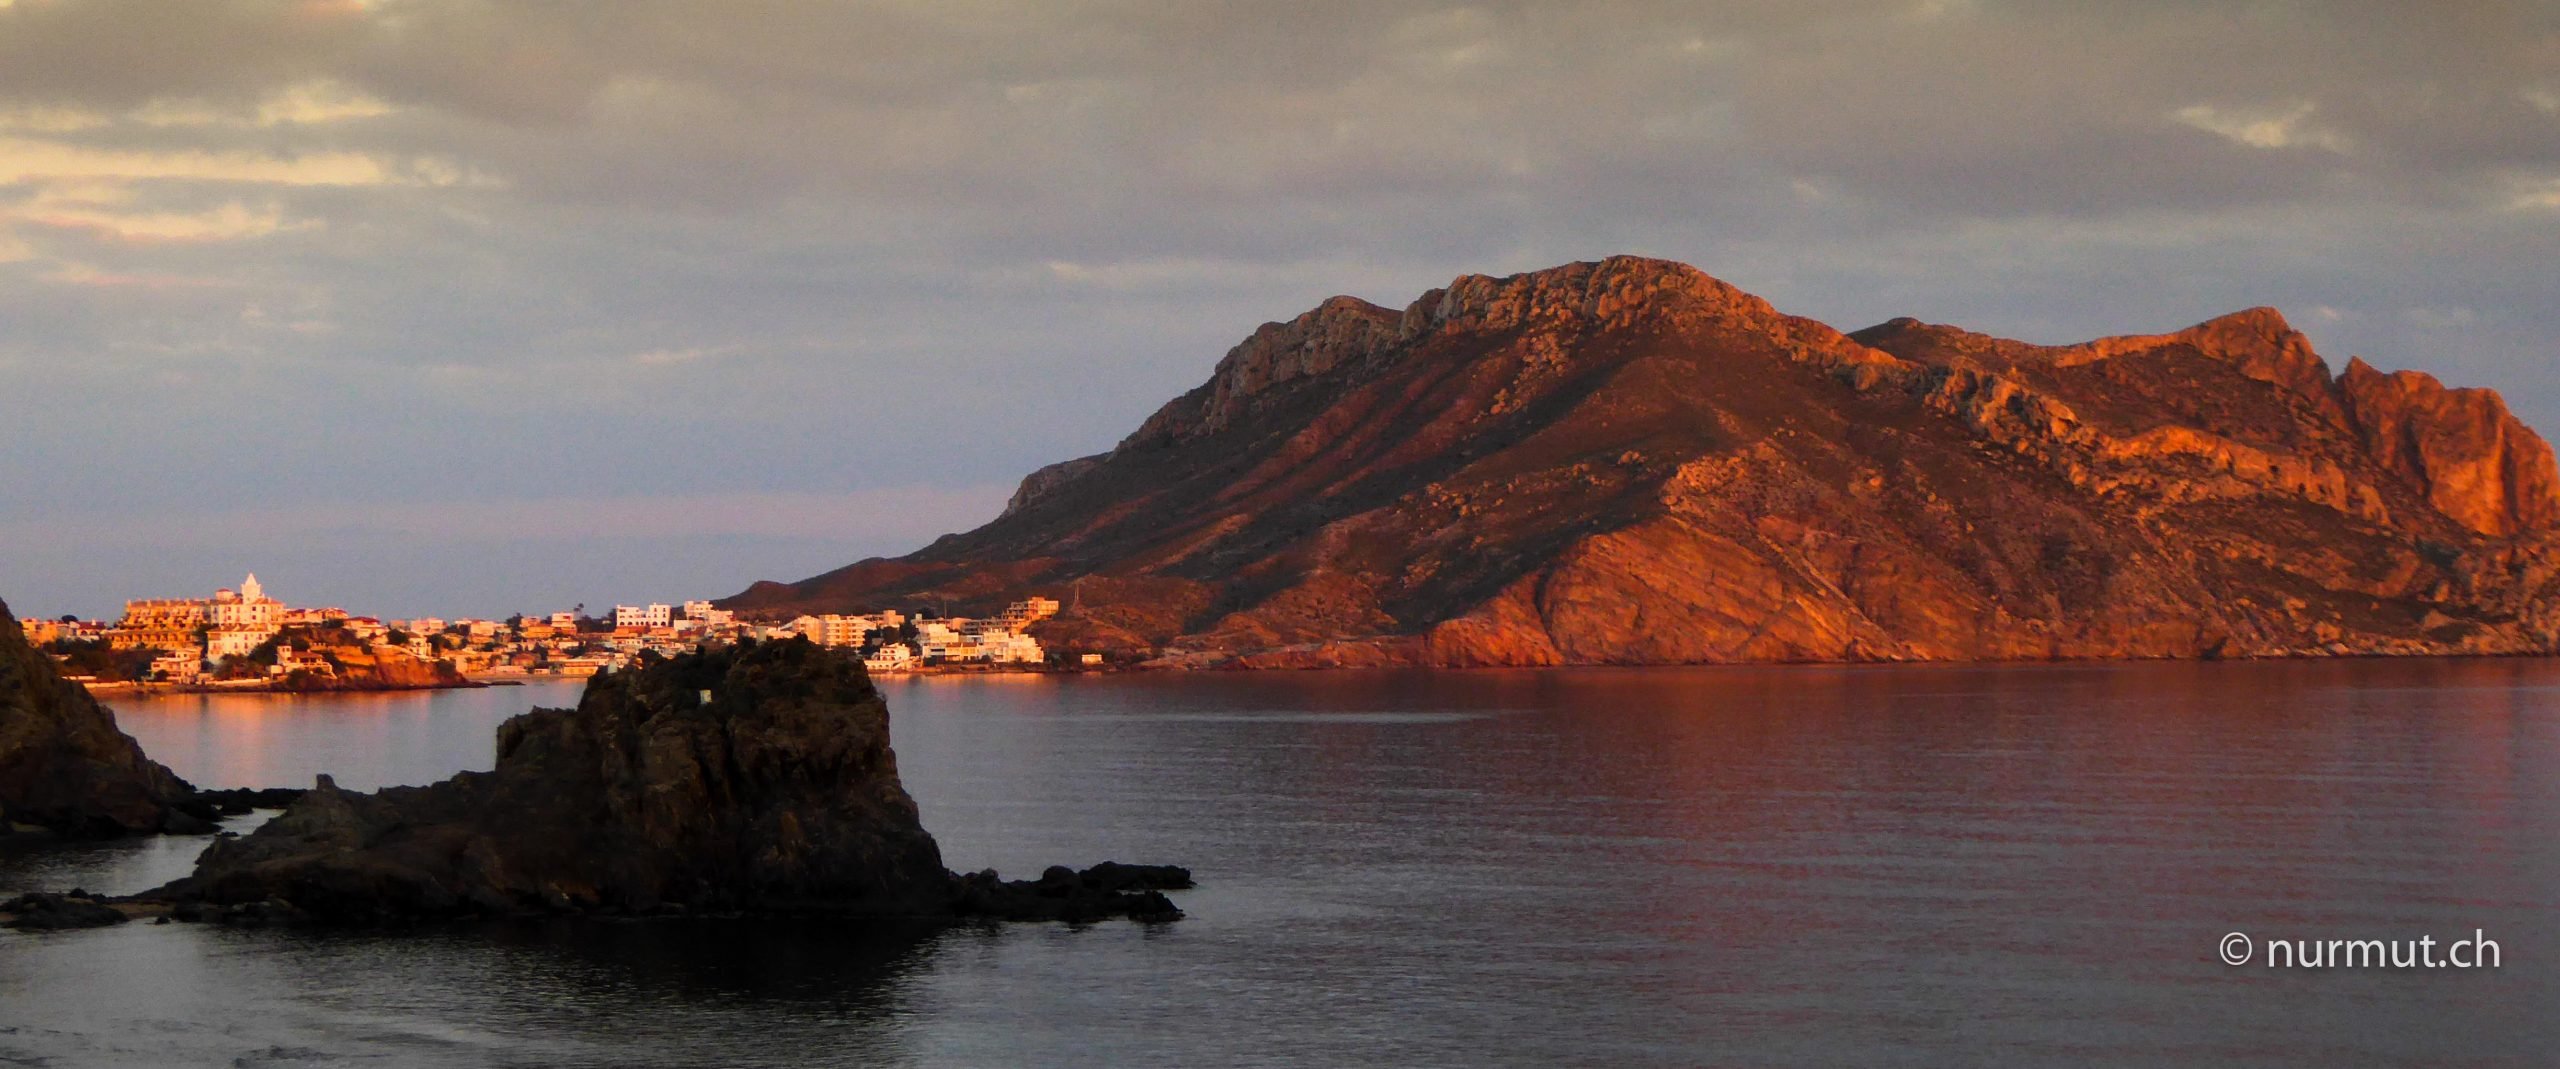 das-unbekannte-spanien-calabardina-bucht-sonnenuntergang